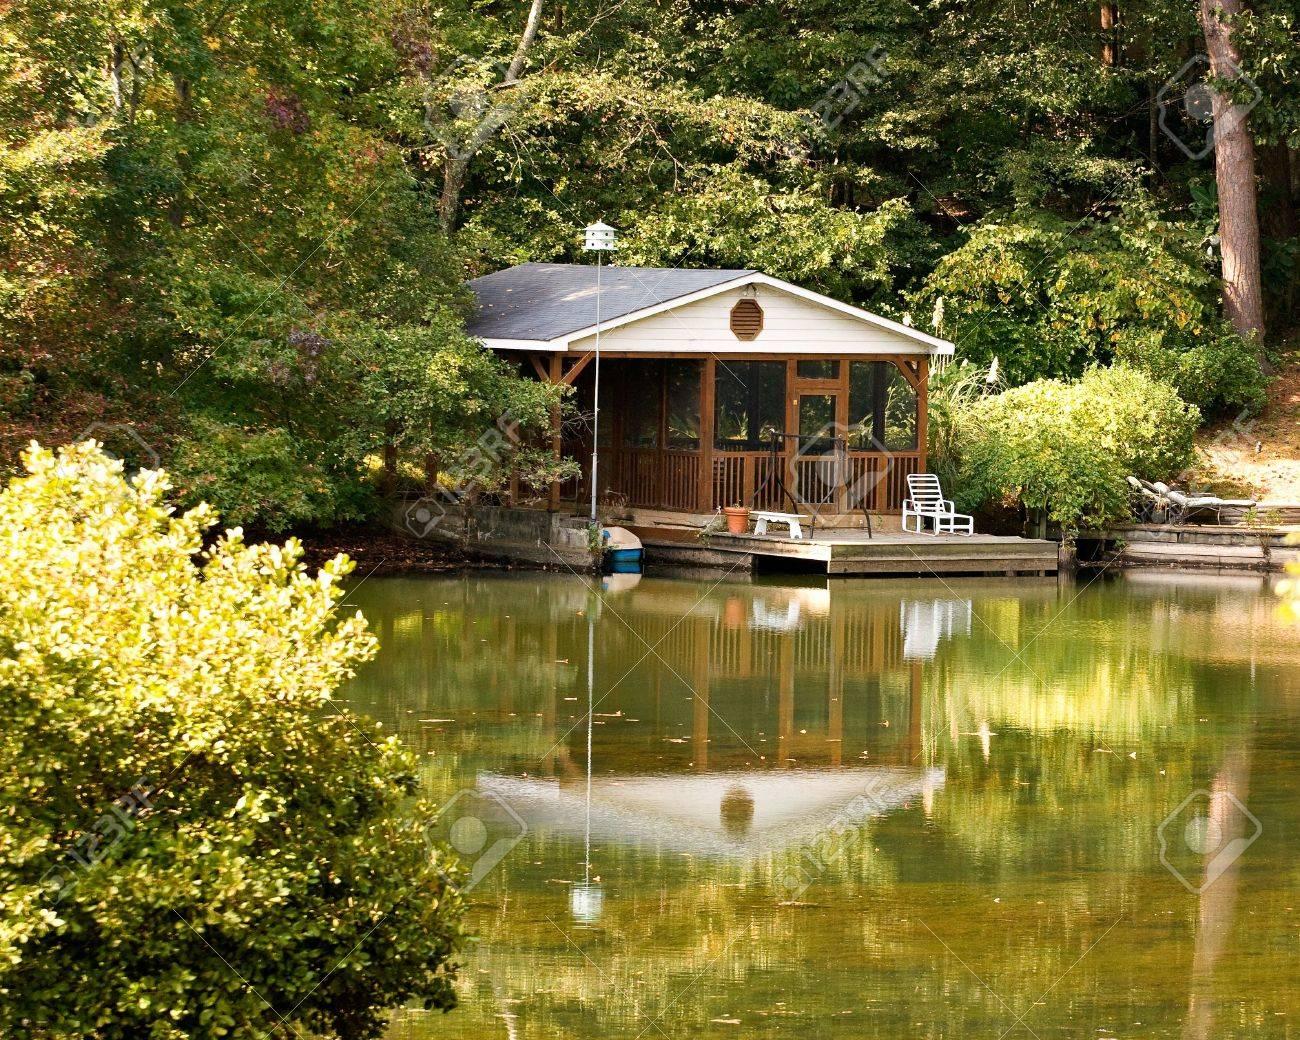 a nice house and boathouse on a placid lake Stock Photo - 3877950